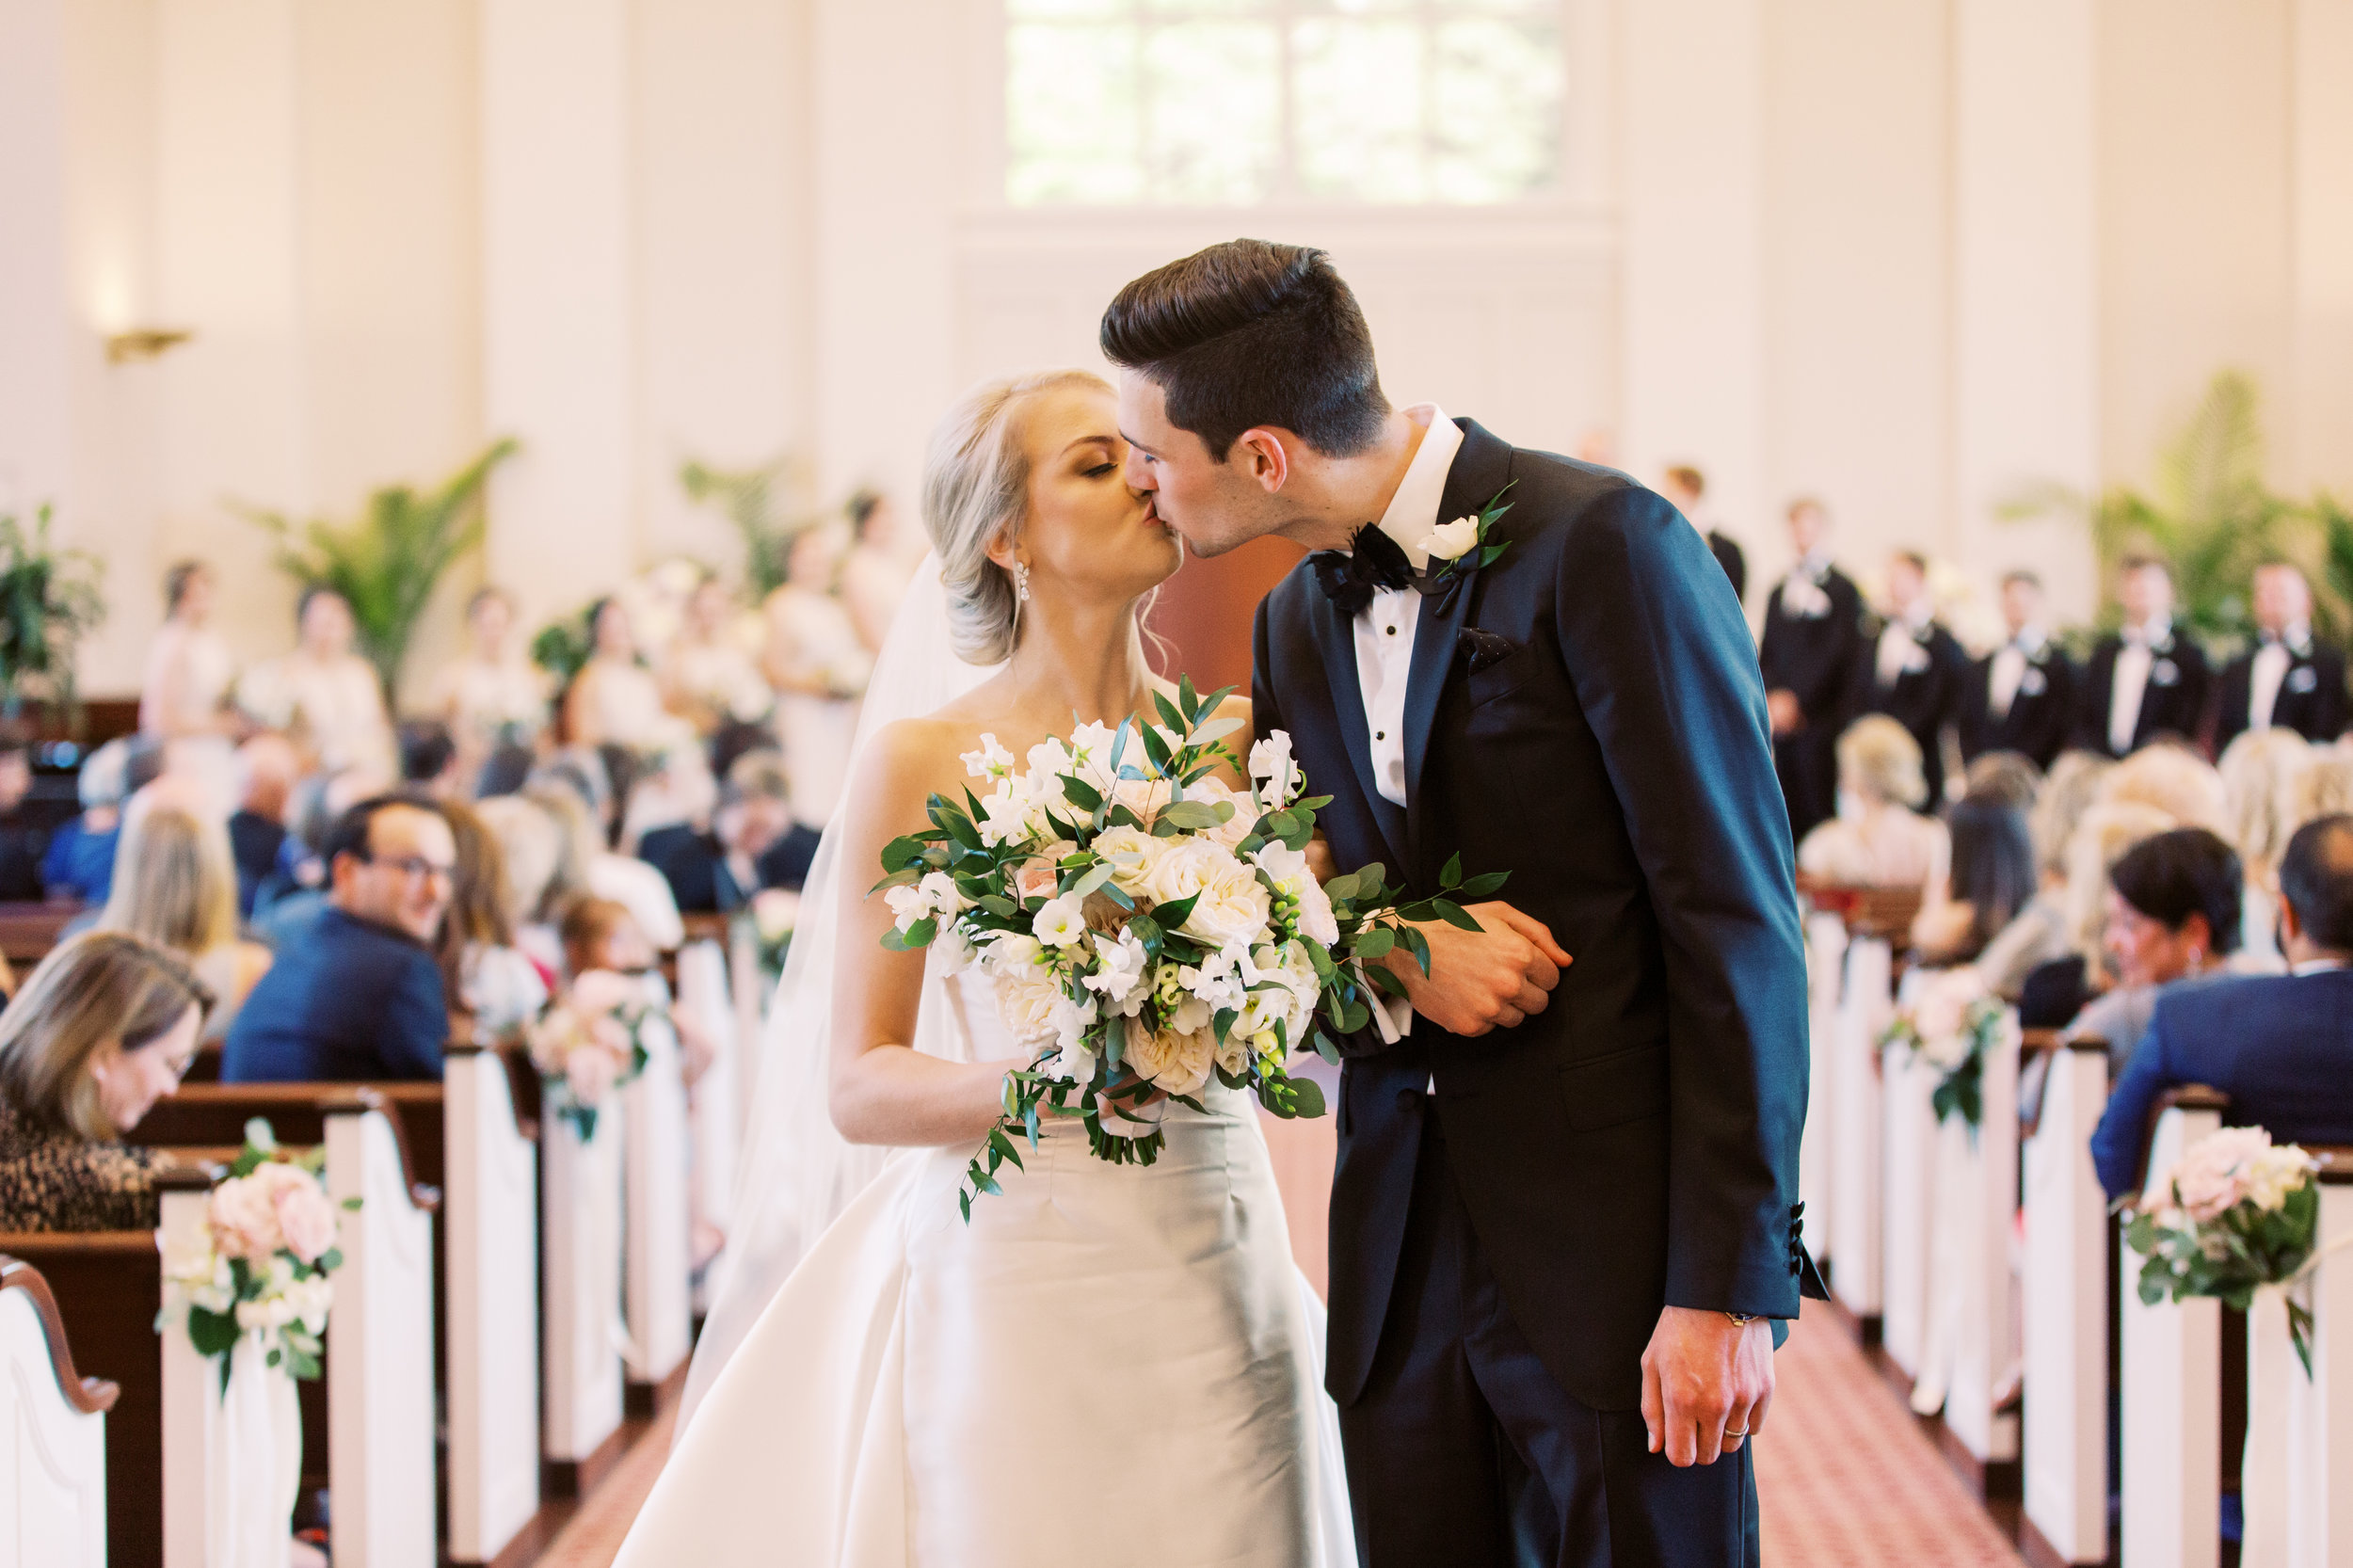 Marie_Perry_Duke_Mansion_Wedding_Charlotte_NC_Abigail_Malone_Photography-338.jpg